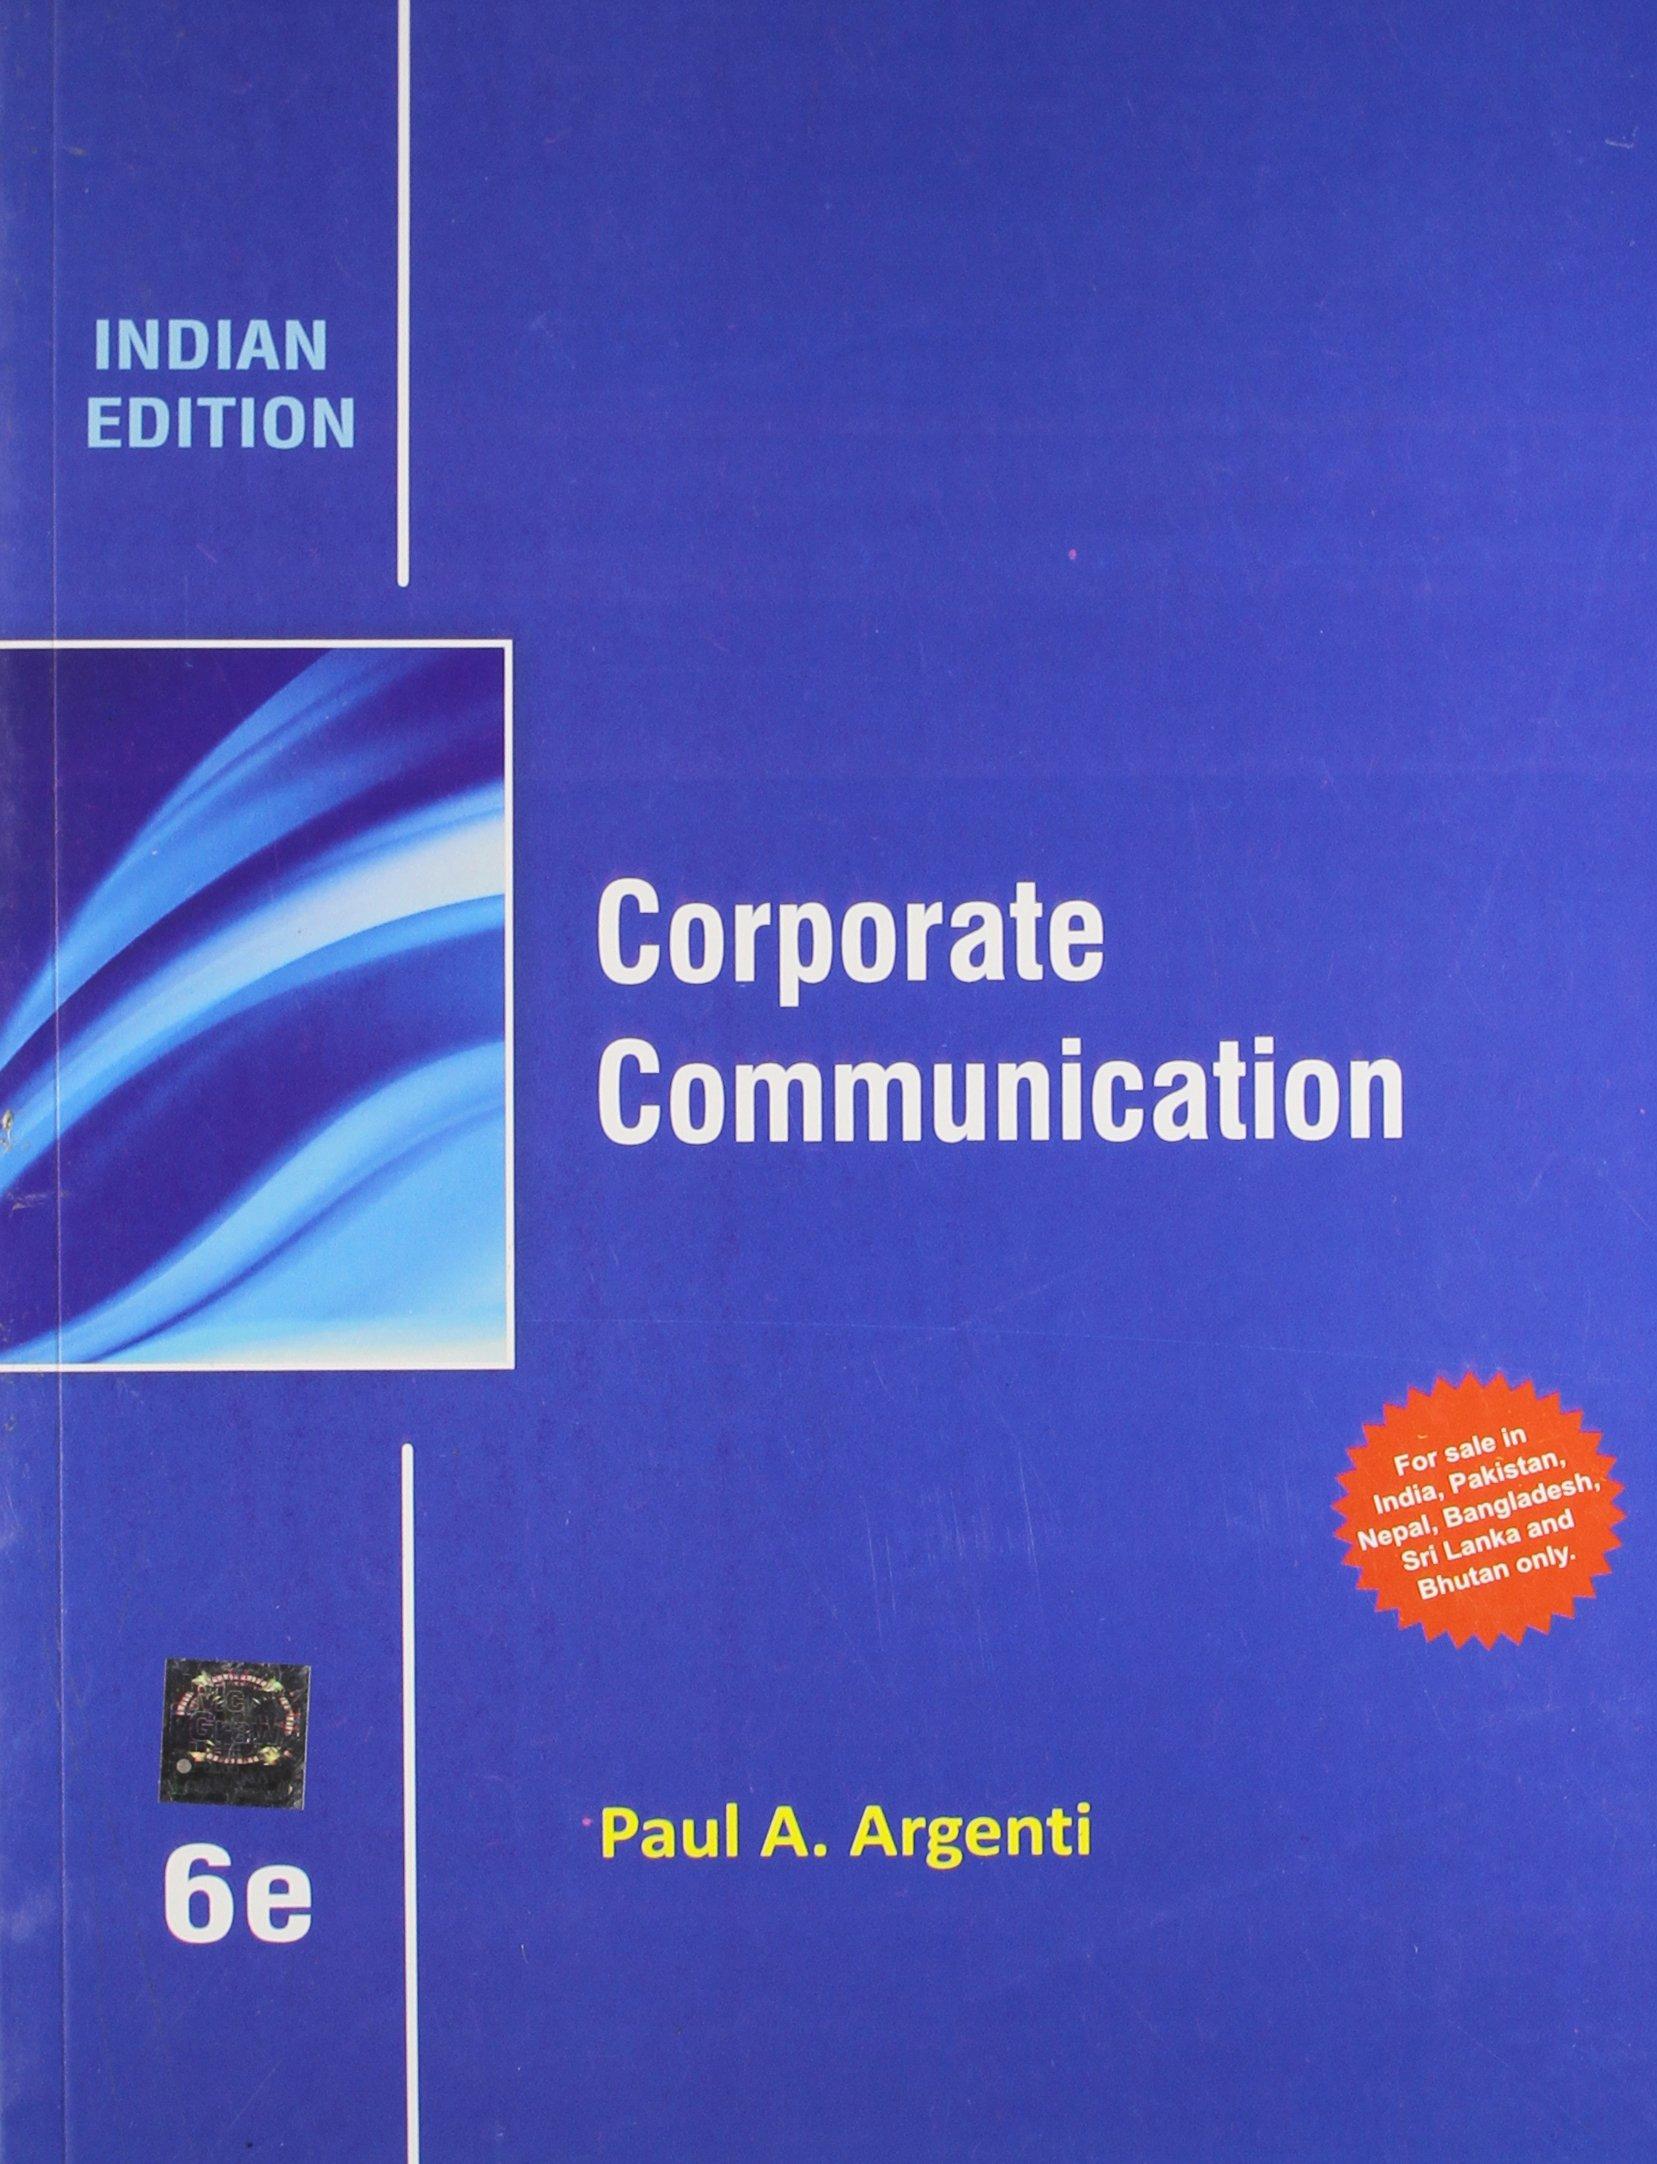 Corporate communication 6th edition paul a. Argenti | ebay.